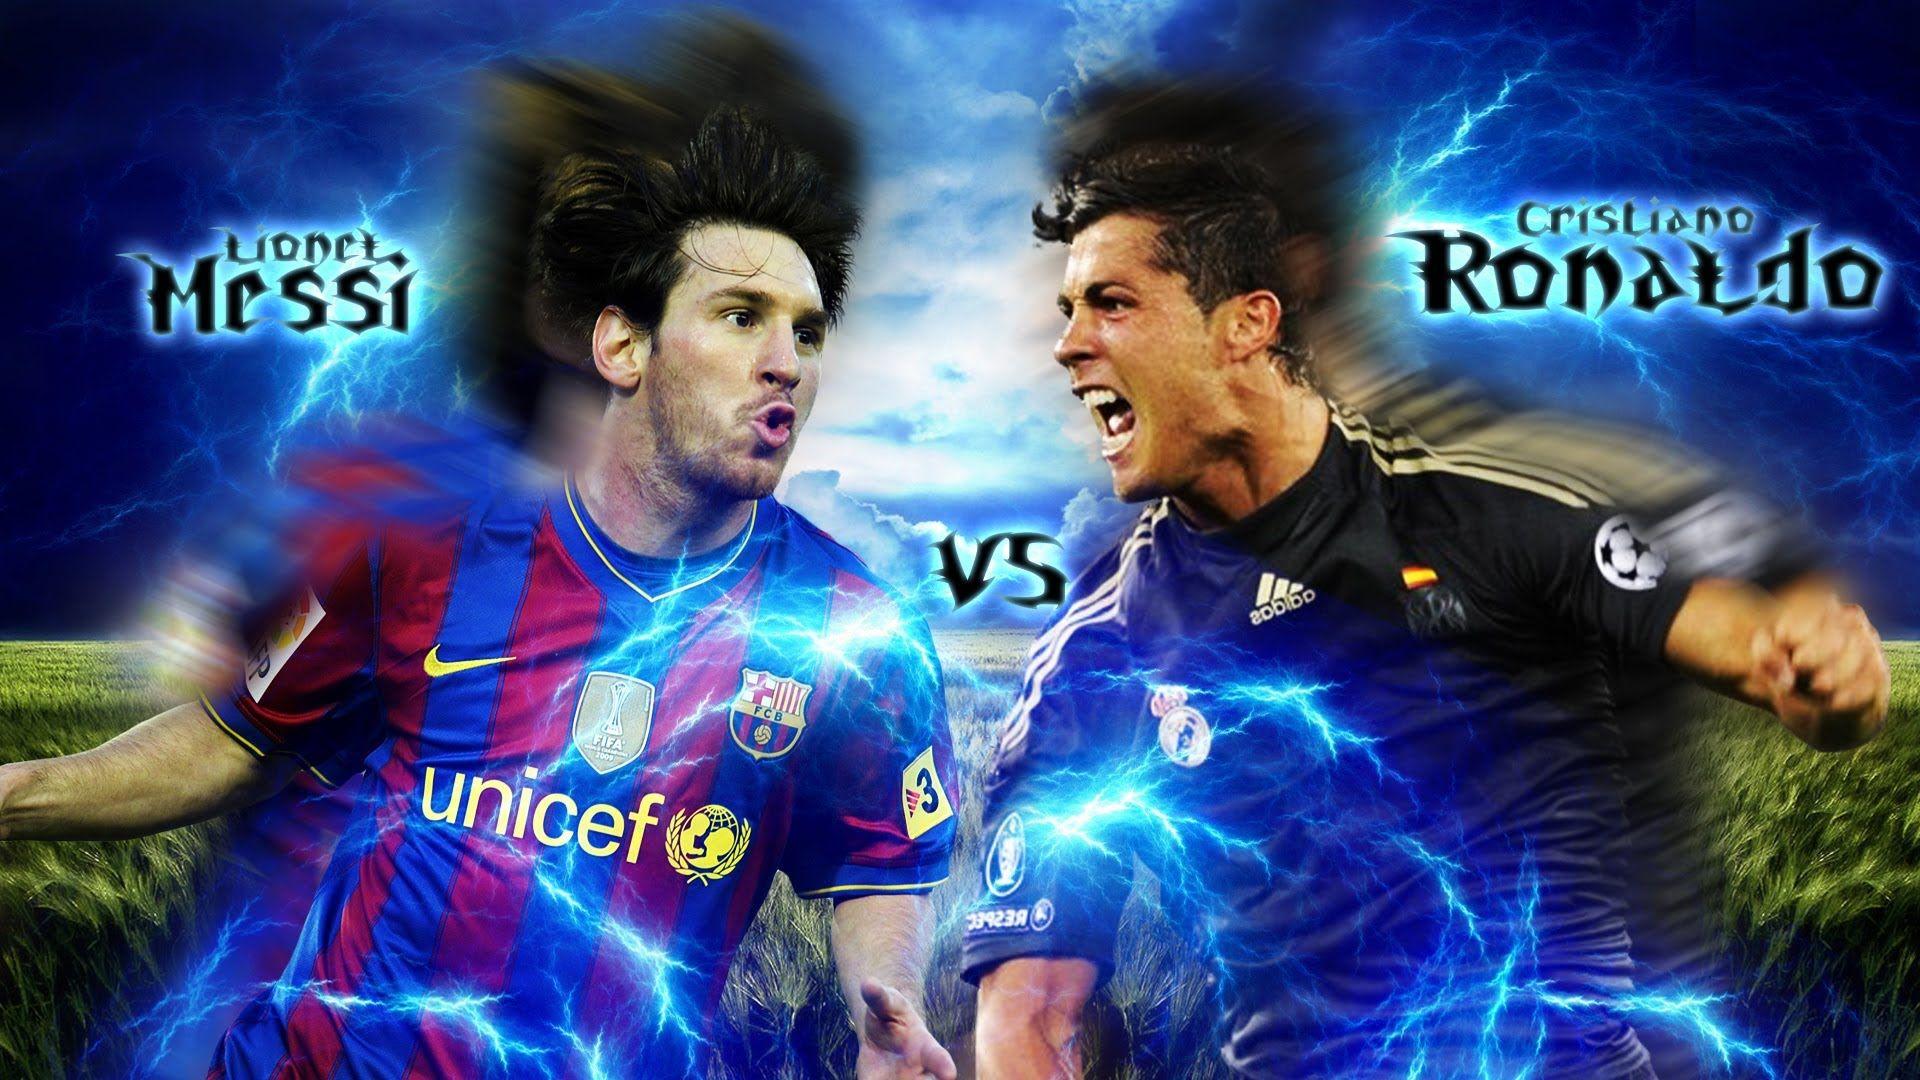 Ronaldo Vs Messi Wallpaper Full Hd 8jn In 2019 Messi Vs